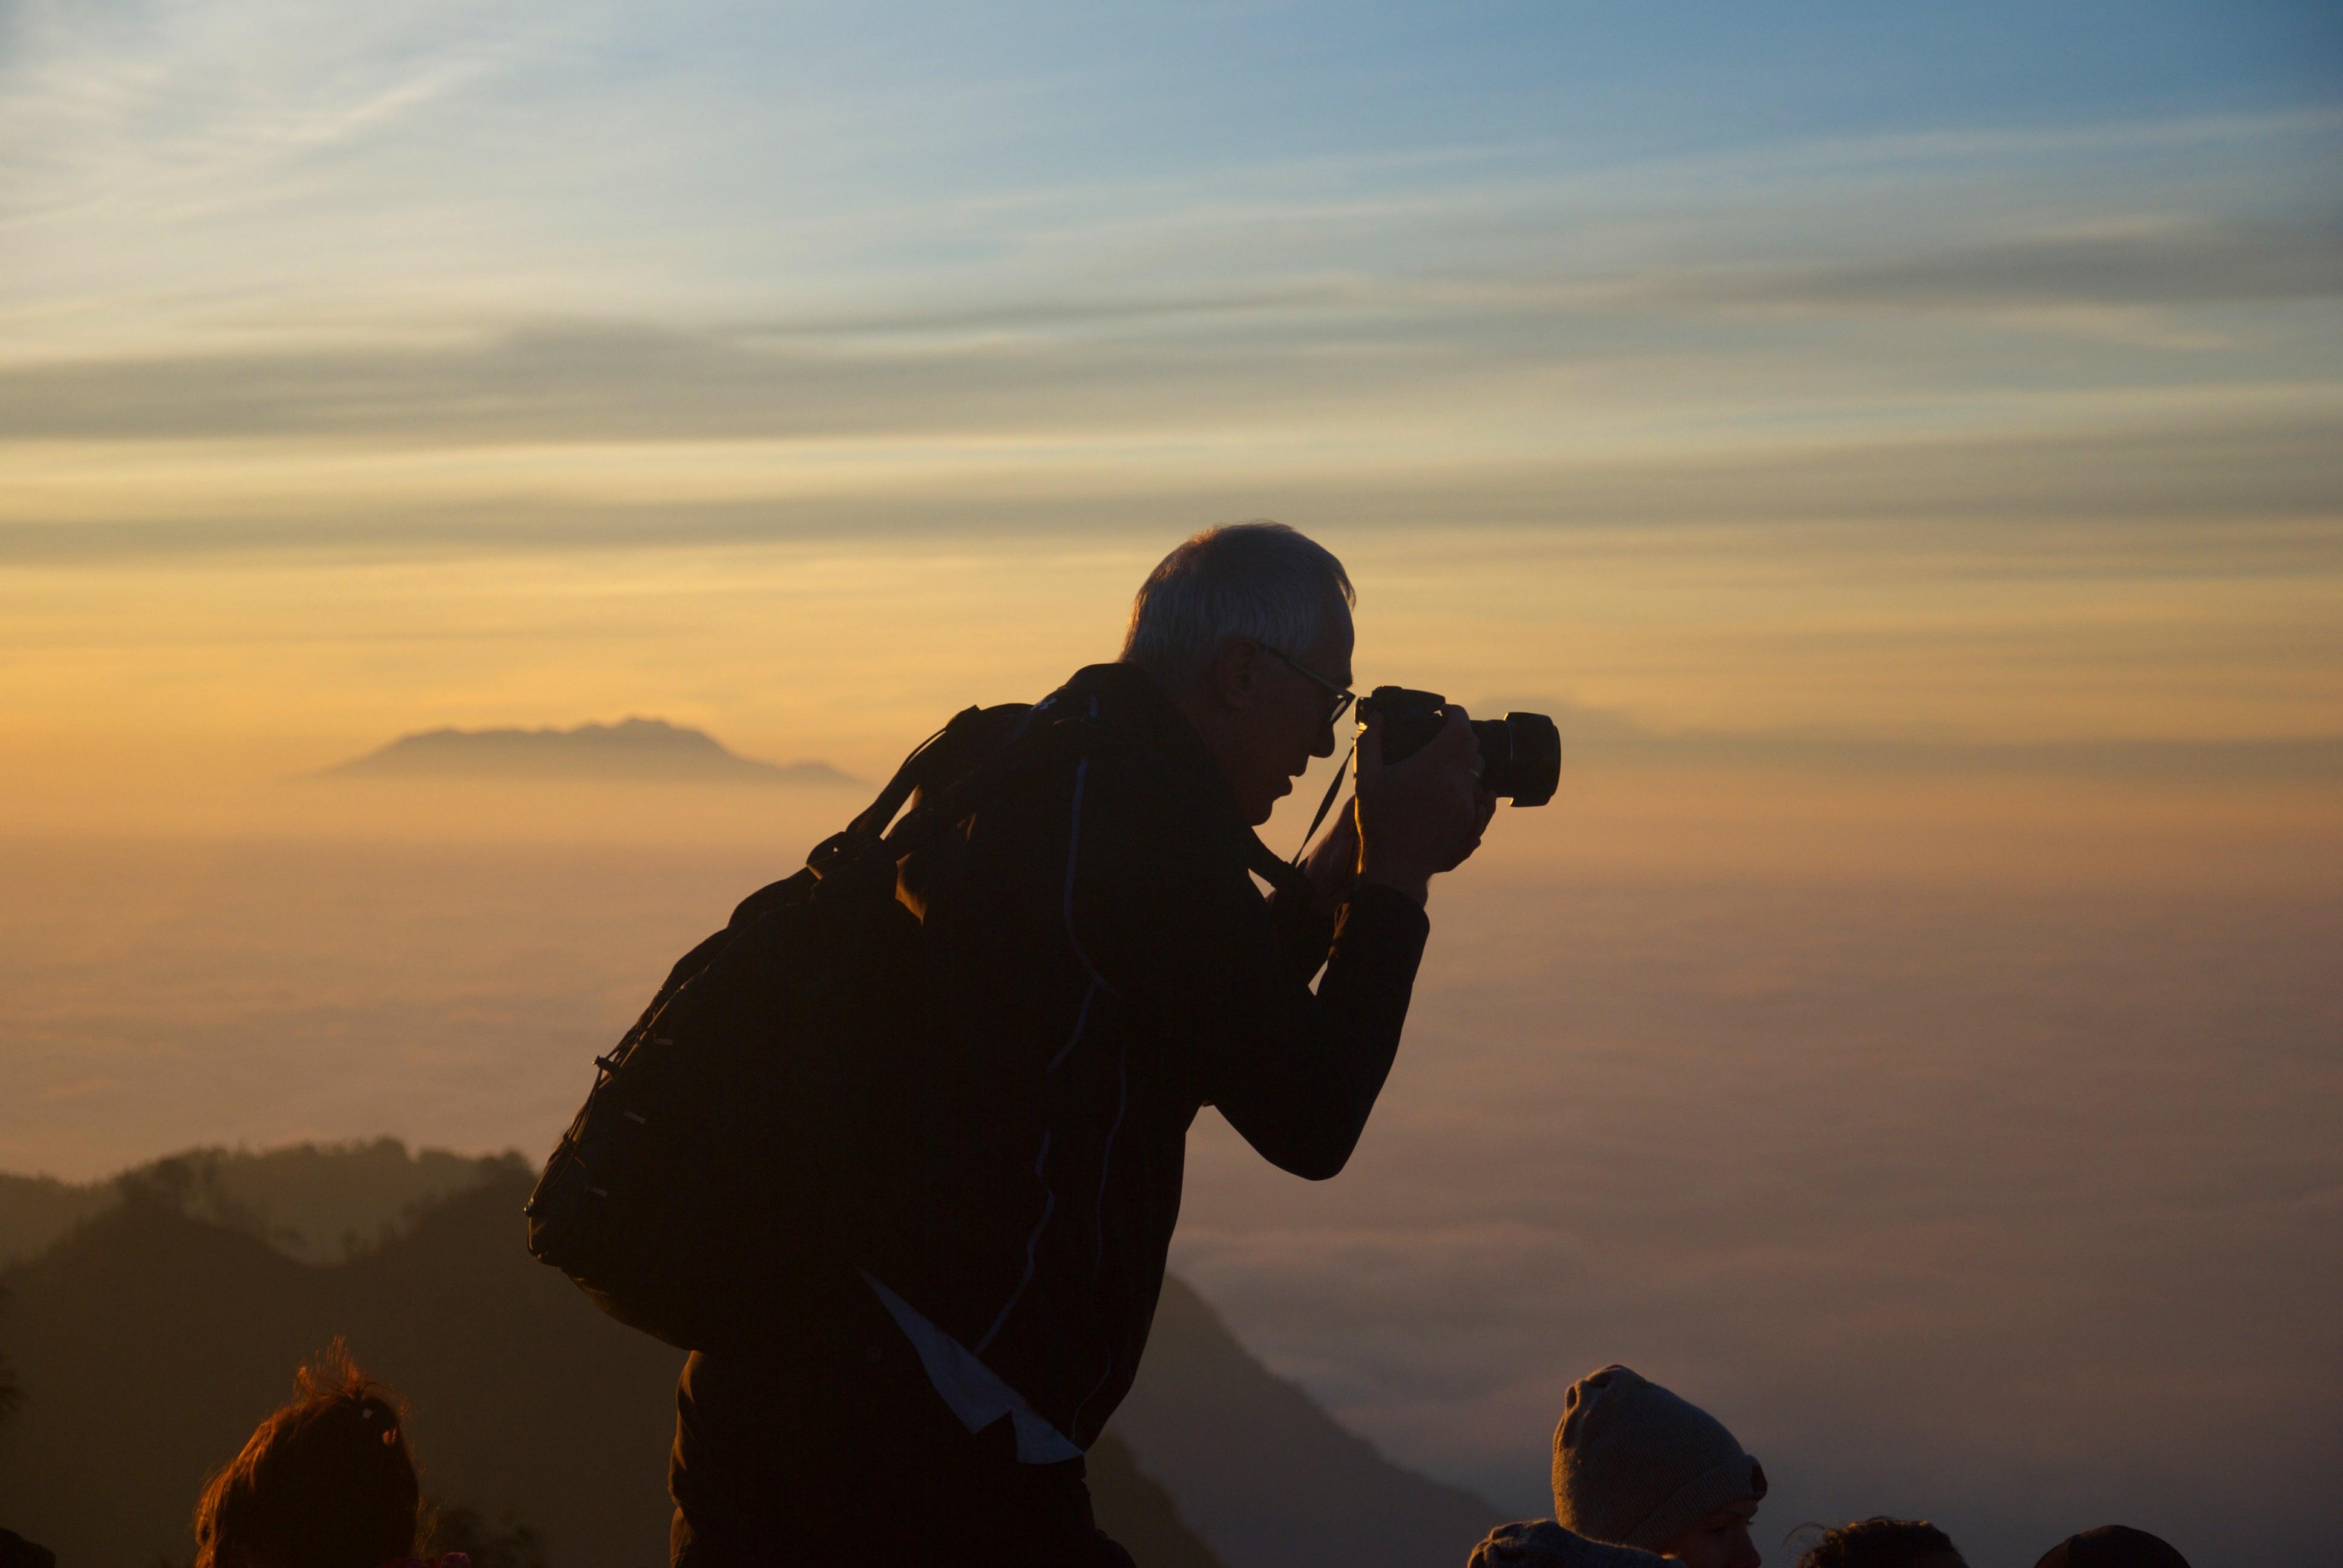 Capturing nature photo